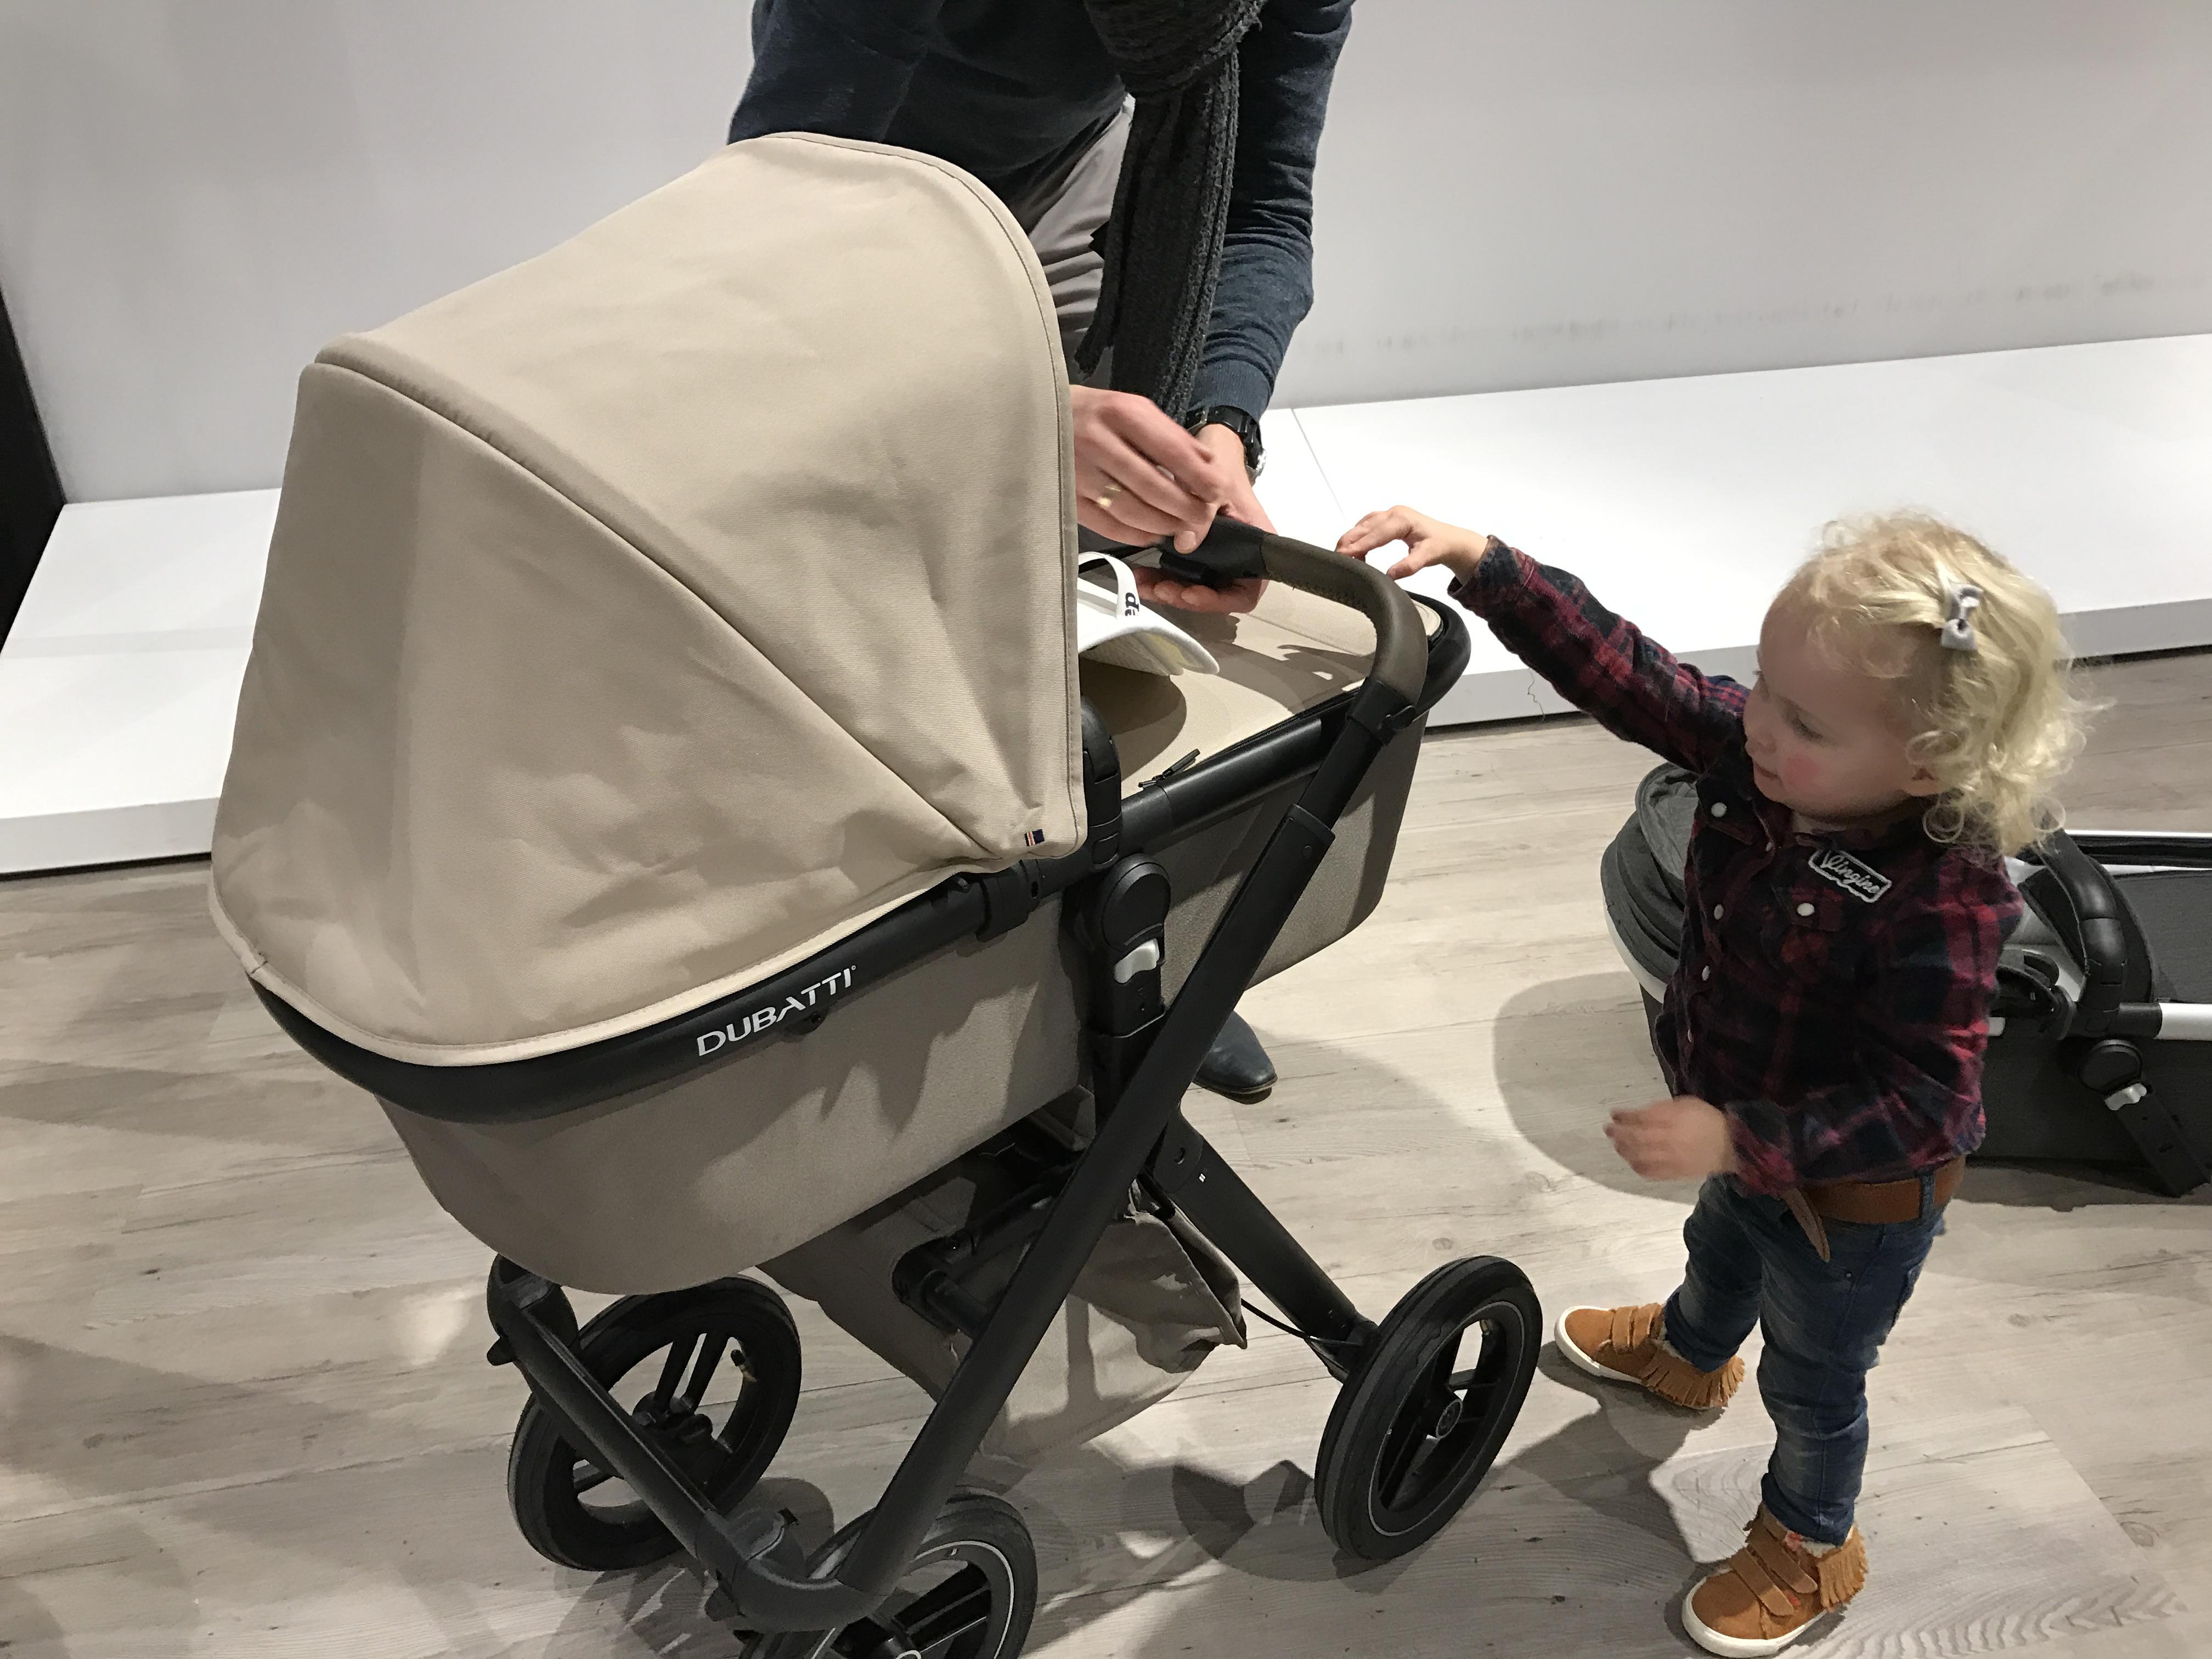 Mijn ervaring met de dubatti kinderwagen u2013 nanny annelon